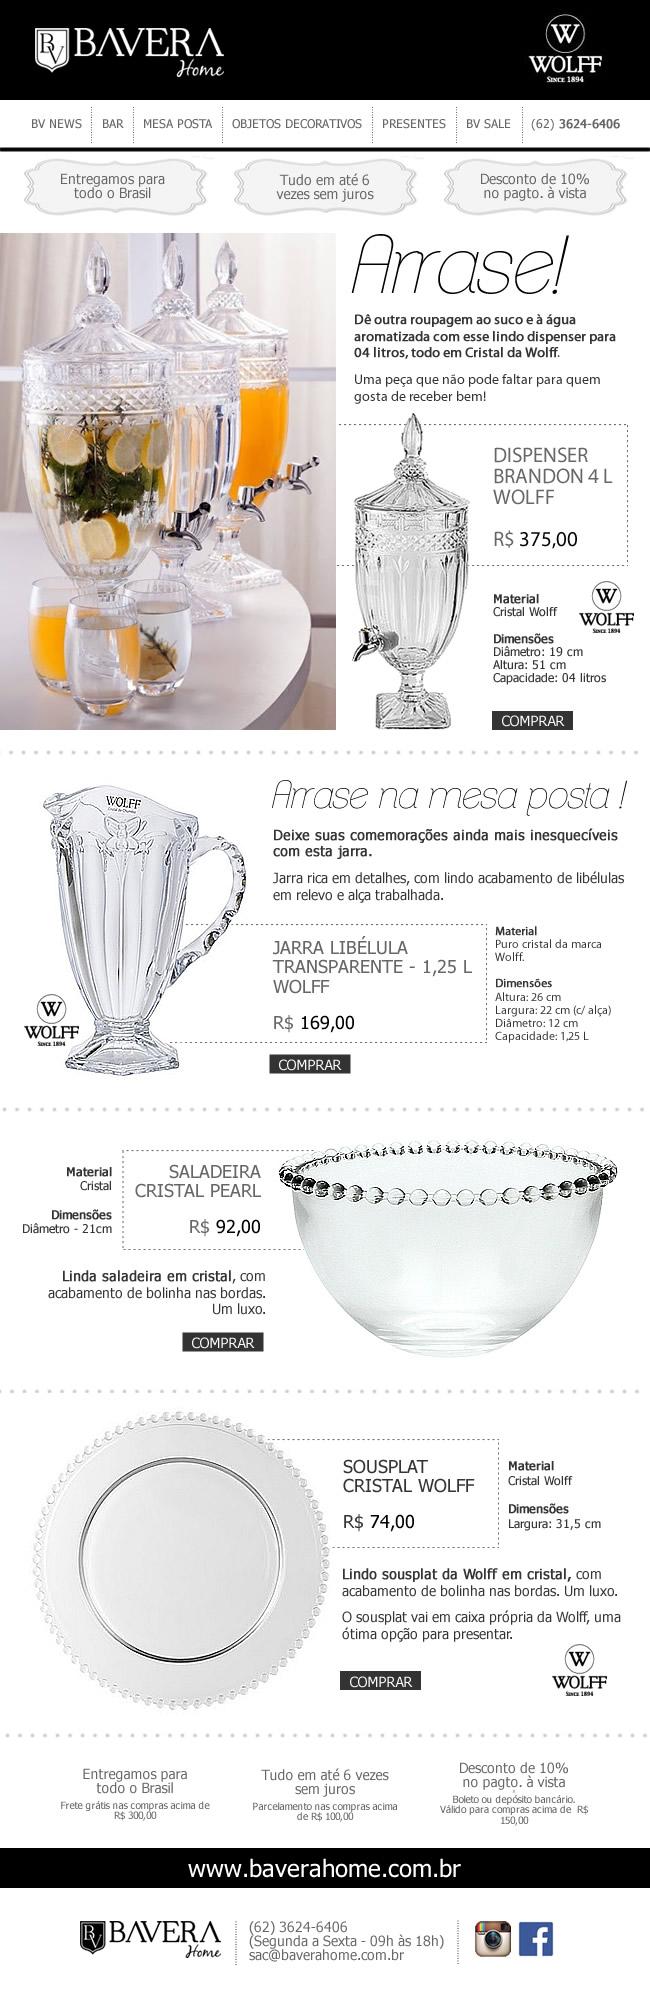 E-mail marketing para loja virtual | Osvaldo Almeida Designer gráfico freelancer